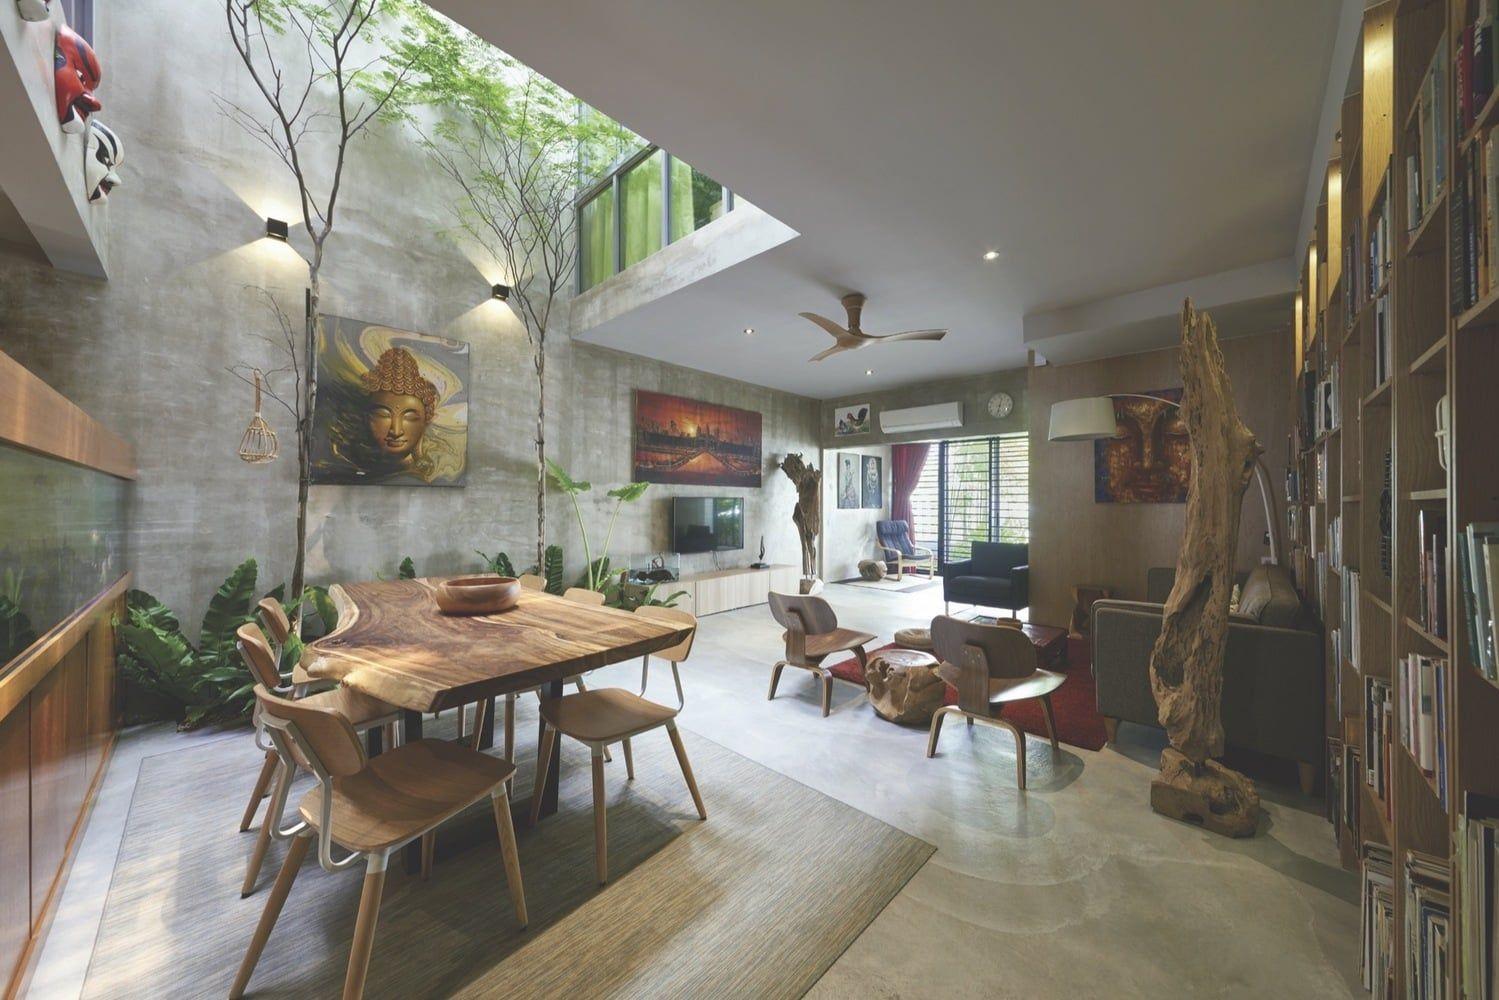 Modern industrial terrace house interior design in sungai buloh malaysia